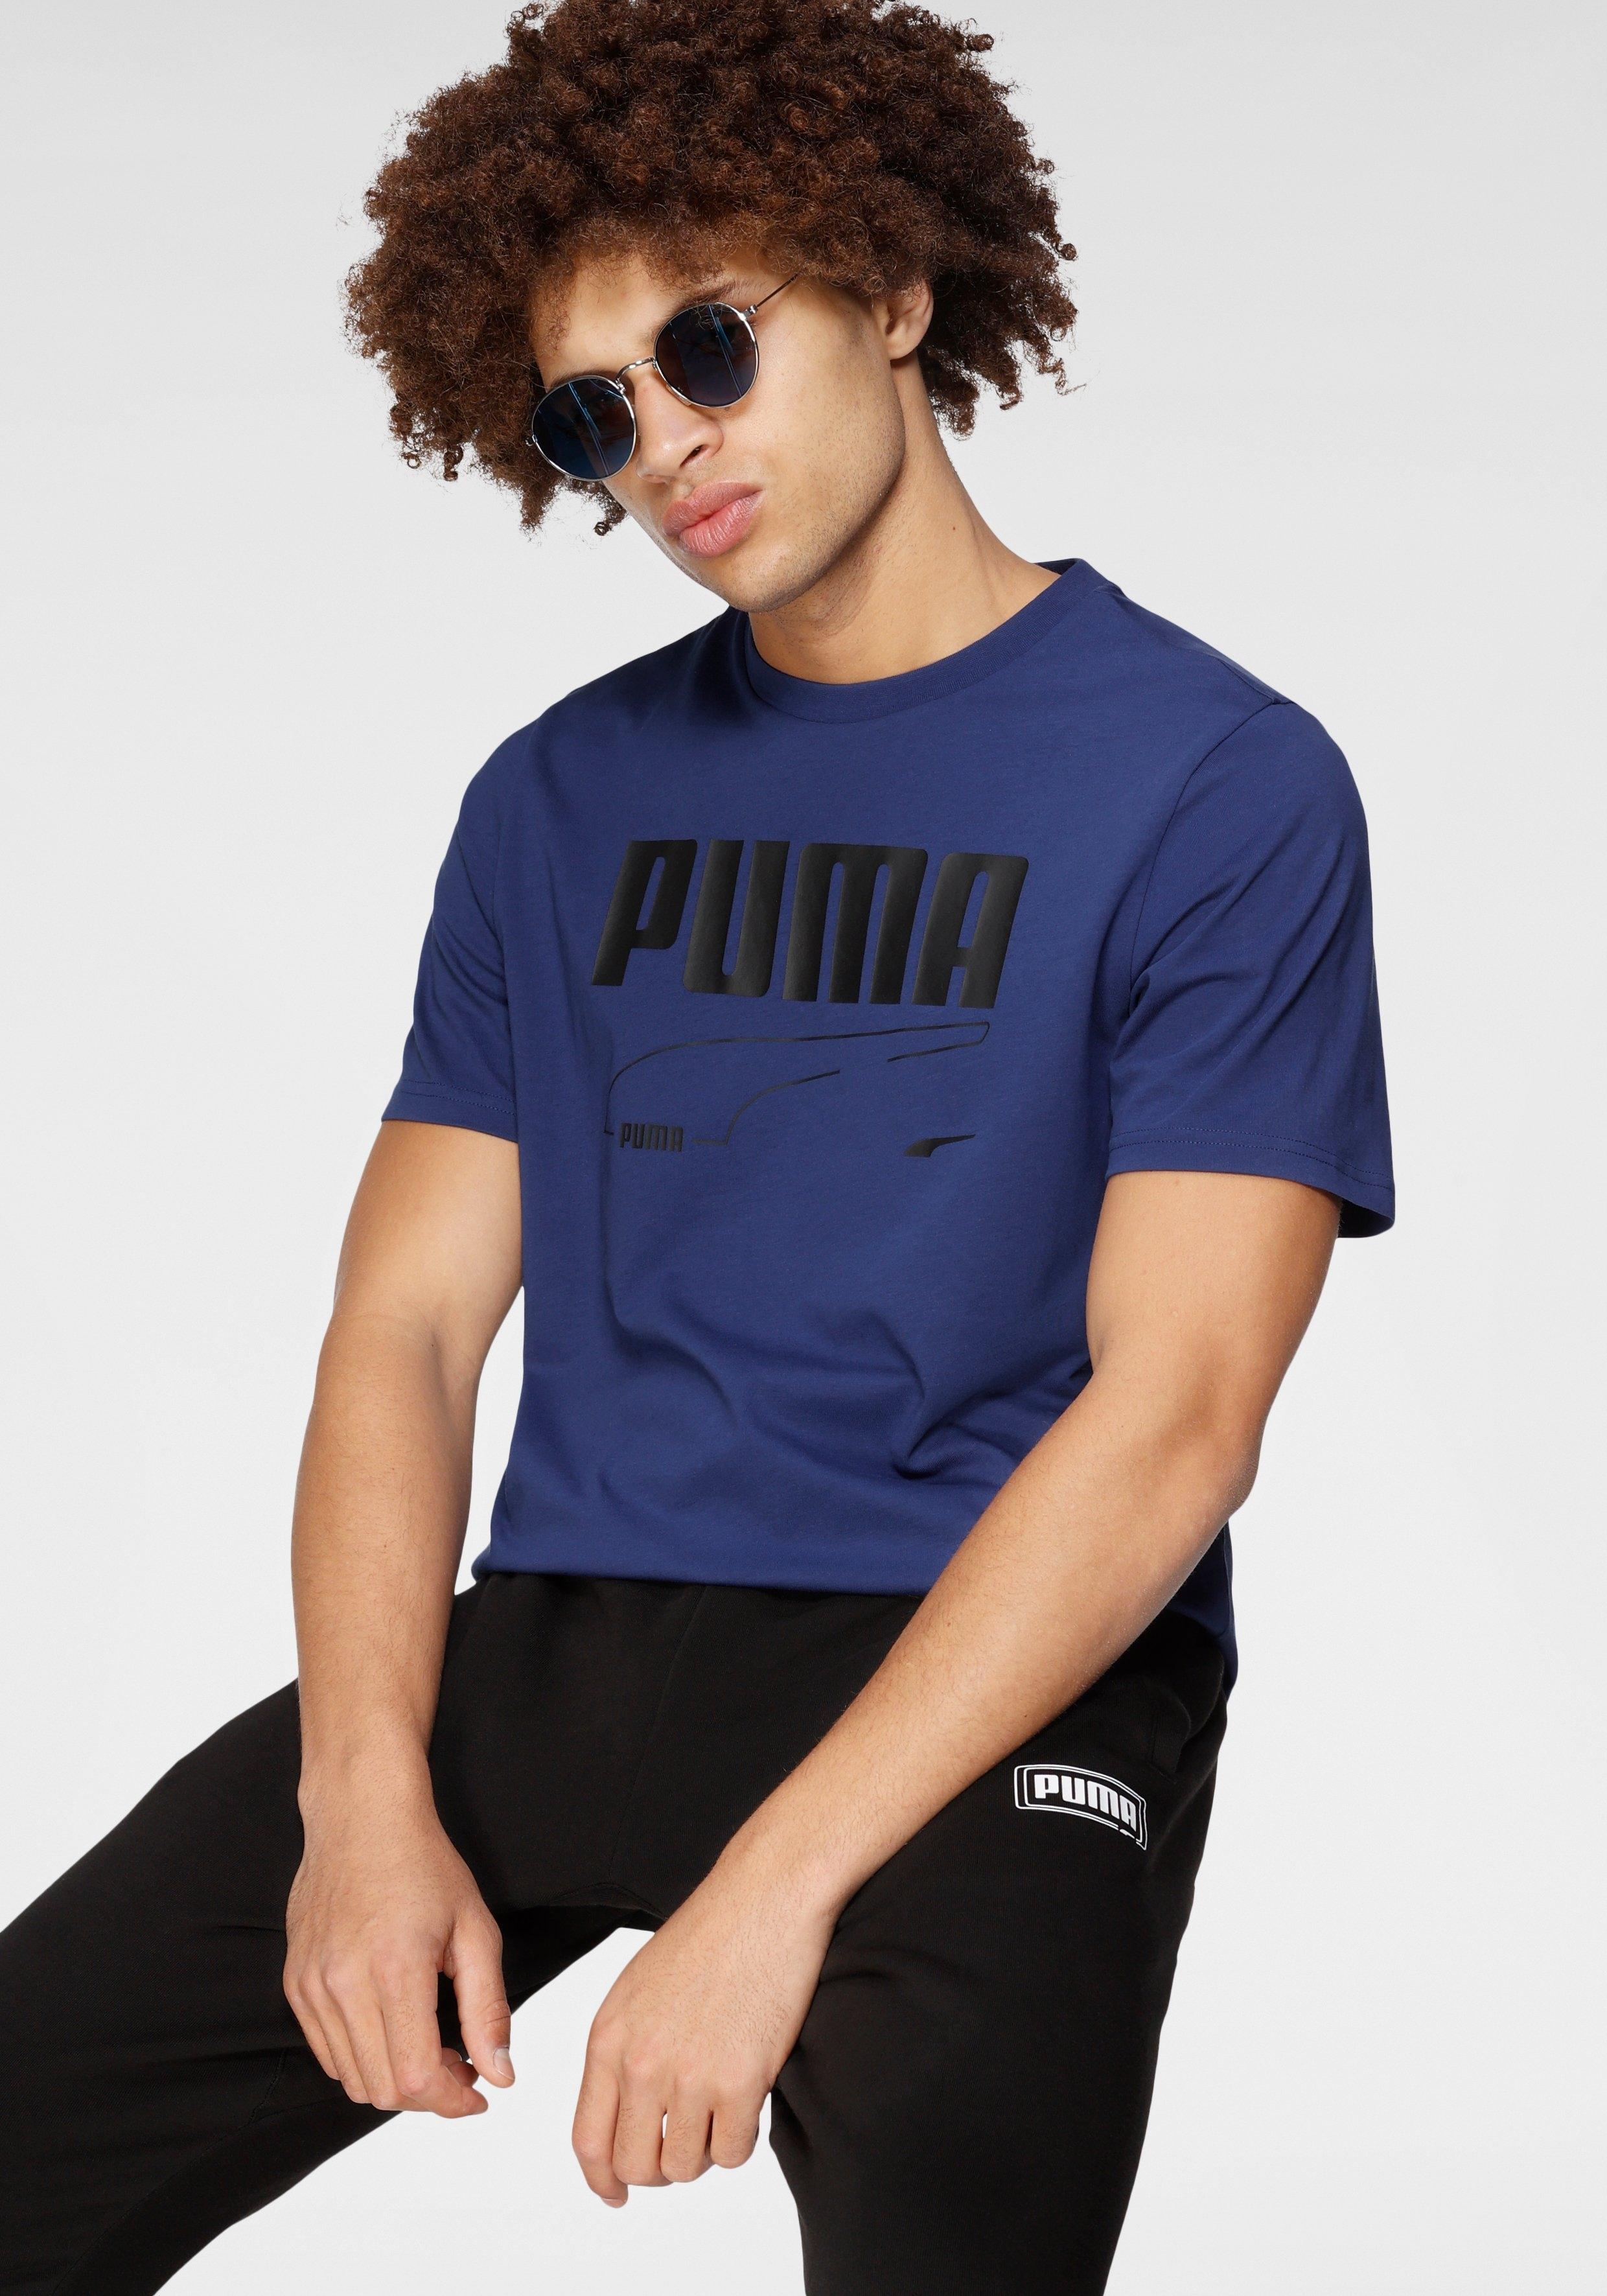 PUMA T-shirt Rebel Tee - verschillende betaalmethodes